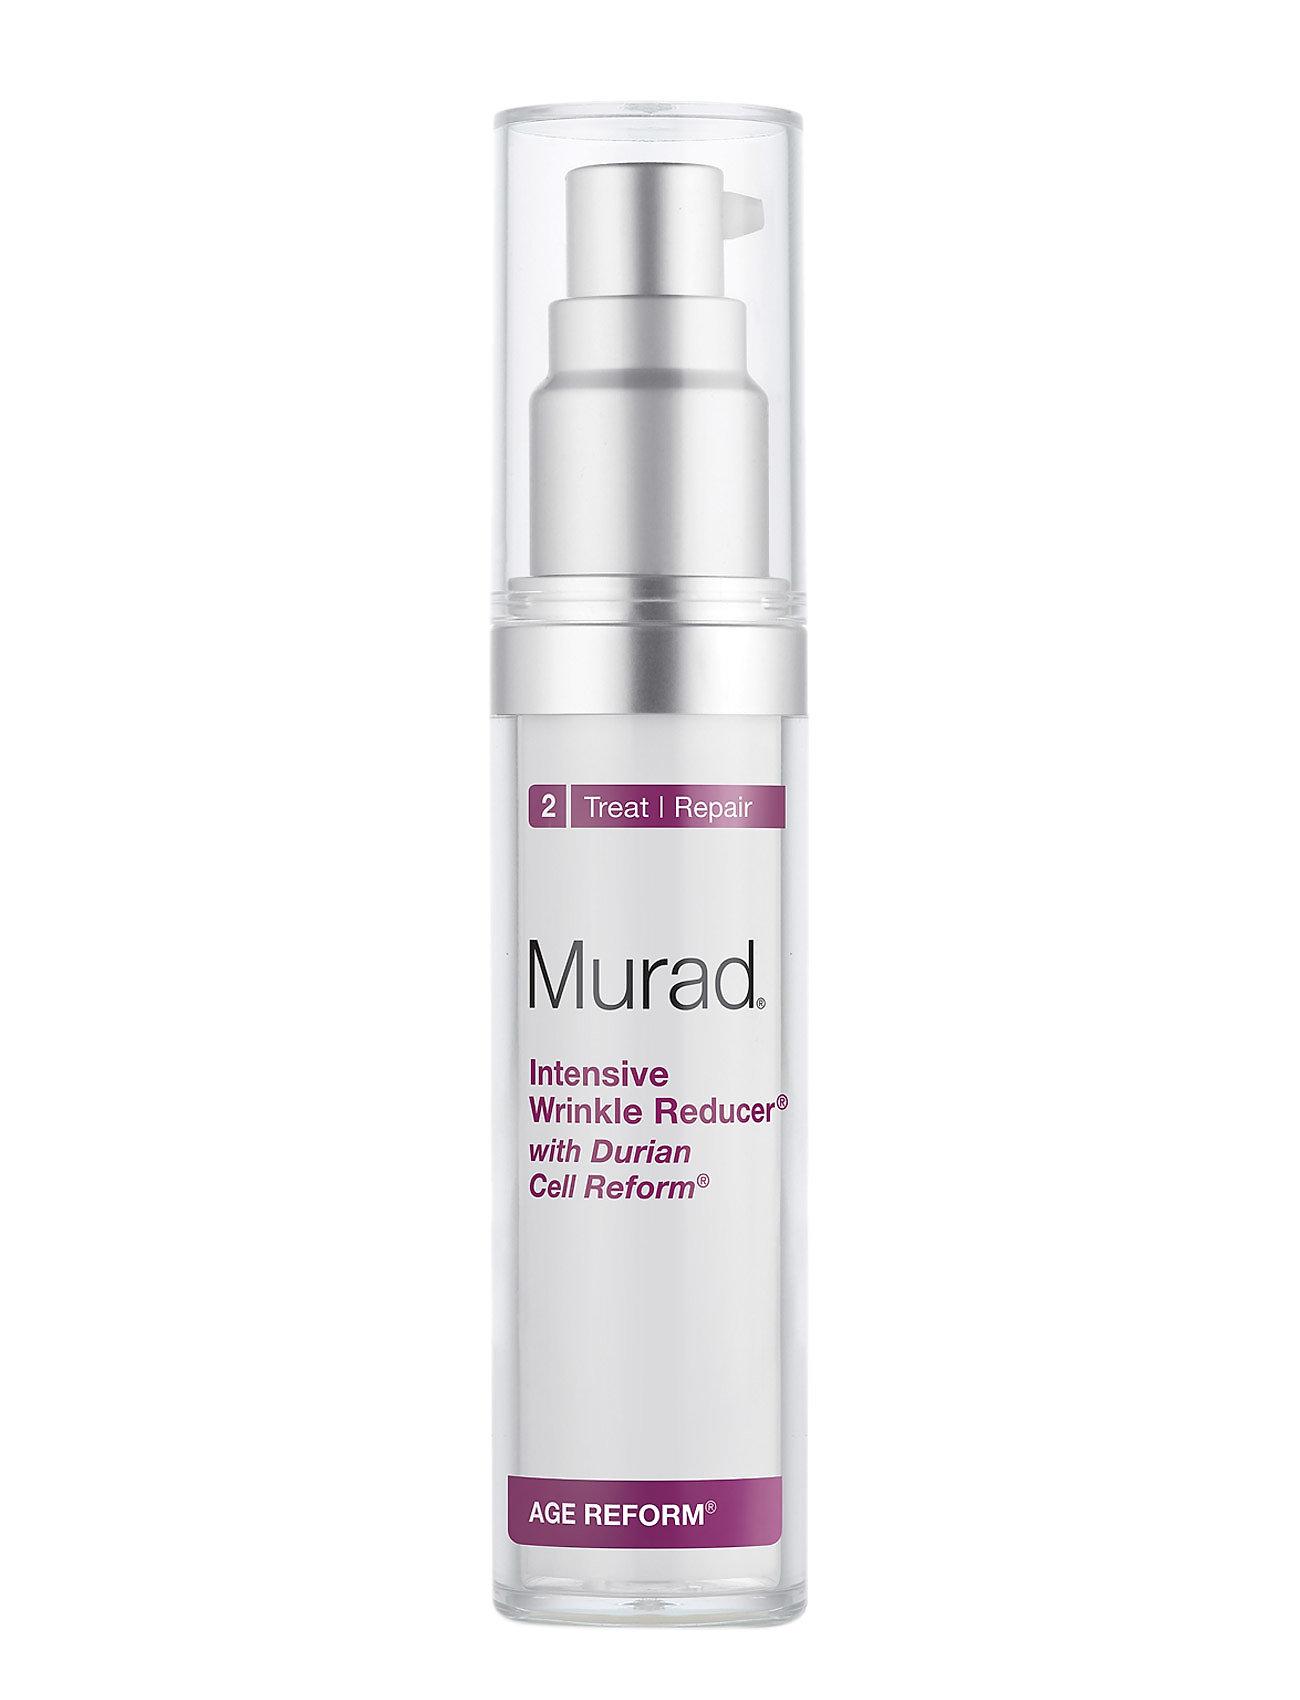 Murad Age Reform Intensive Wrinkle Reducer (2604352231)